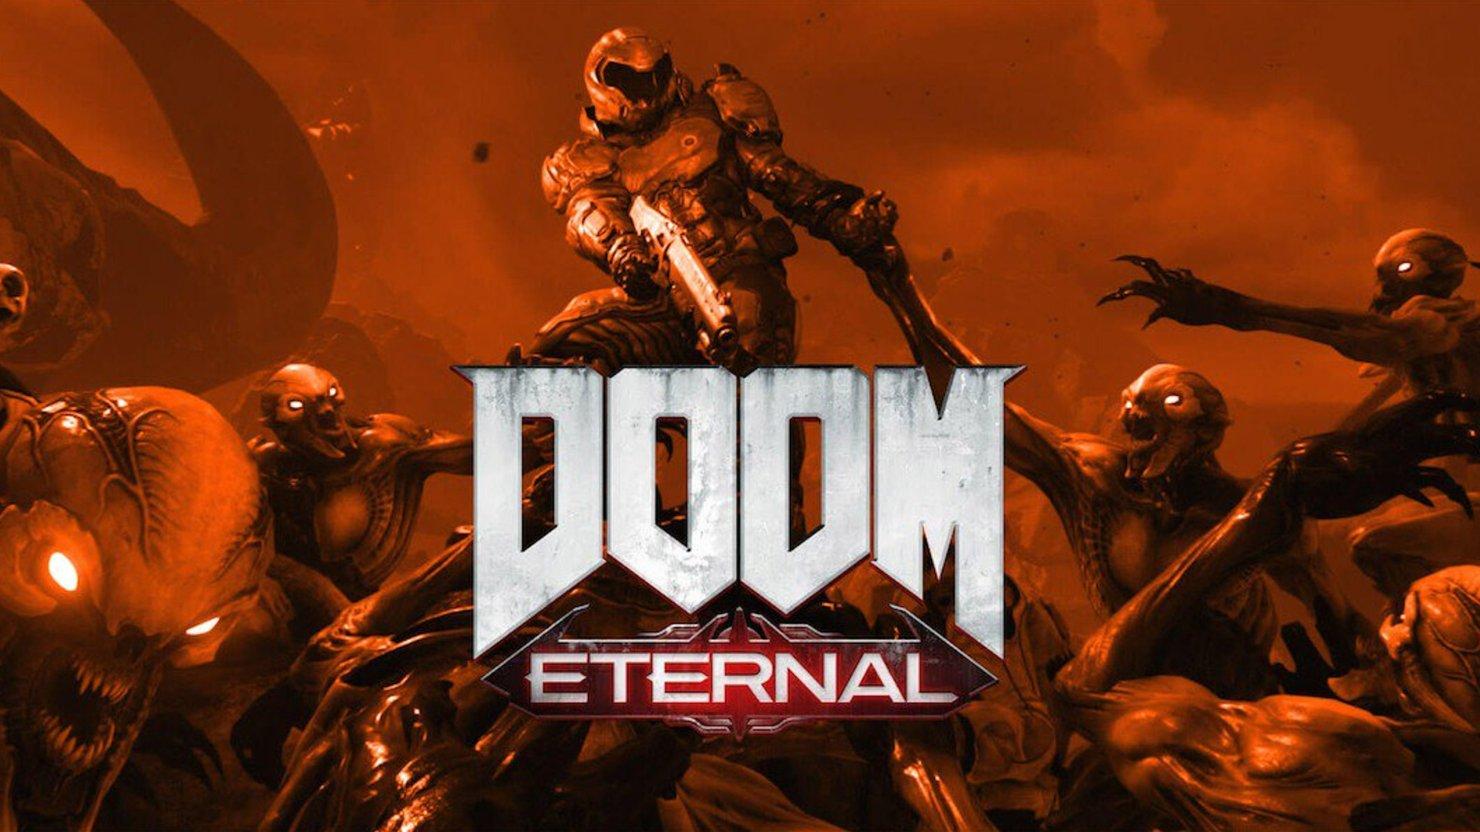 Id Software прояснила ситуацию с саундтреком DOOM Eternal и композитором Миком Гордоном